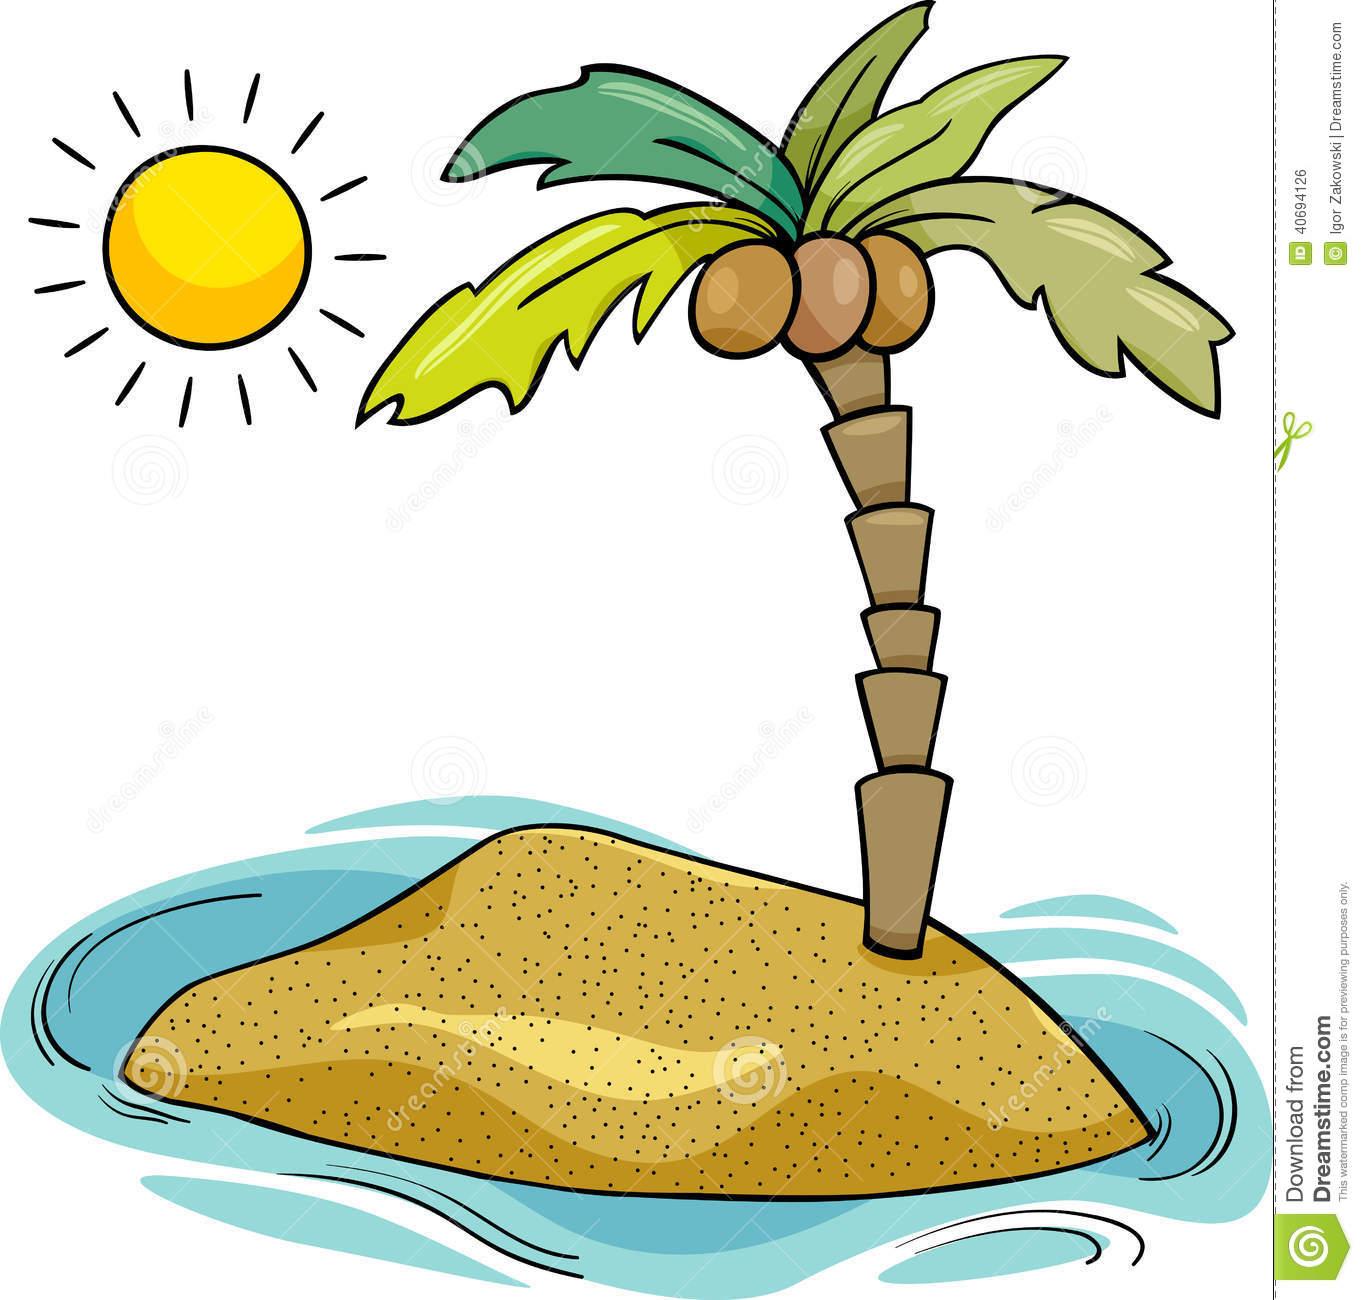 Desert Island Clipart - Clipart Kid